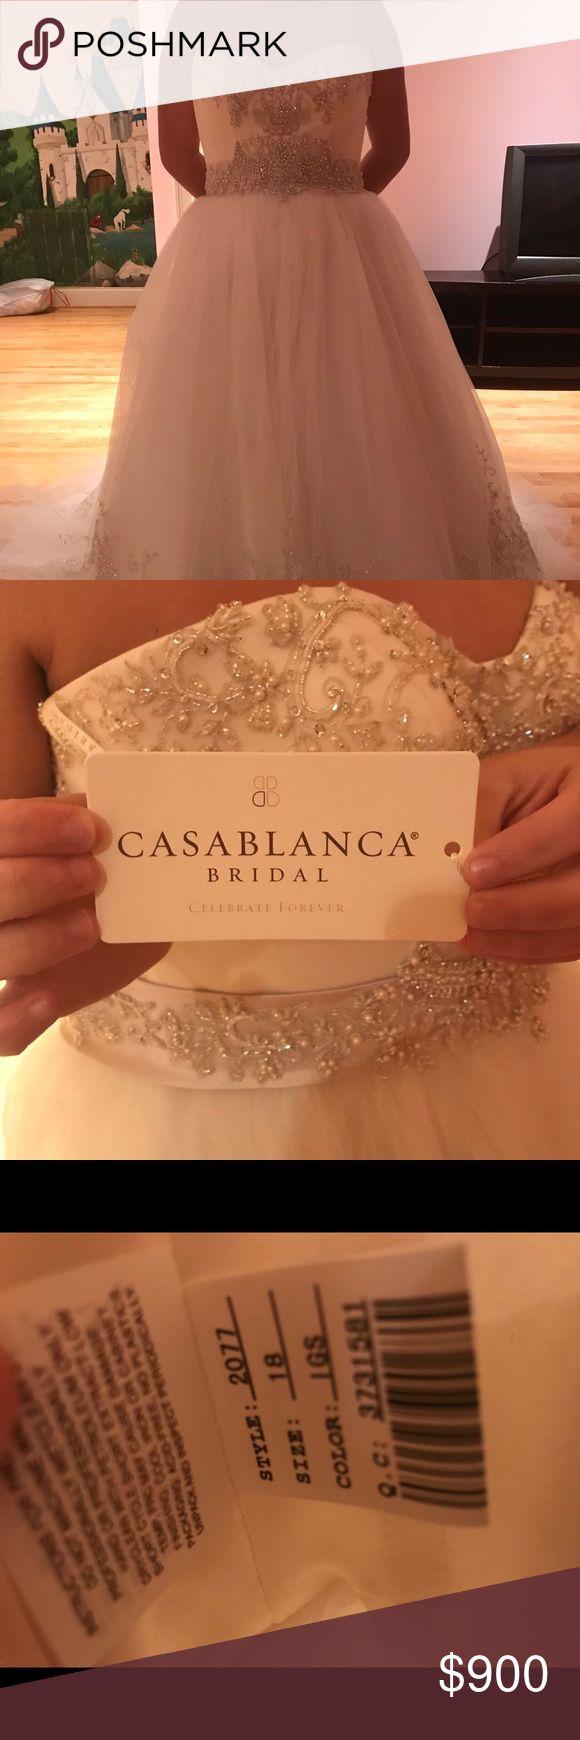 Best 25 sell my wedding dress ideas on pinterest sell for Sell my wedding dress to a store